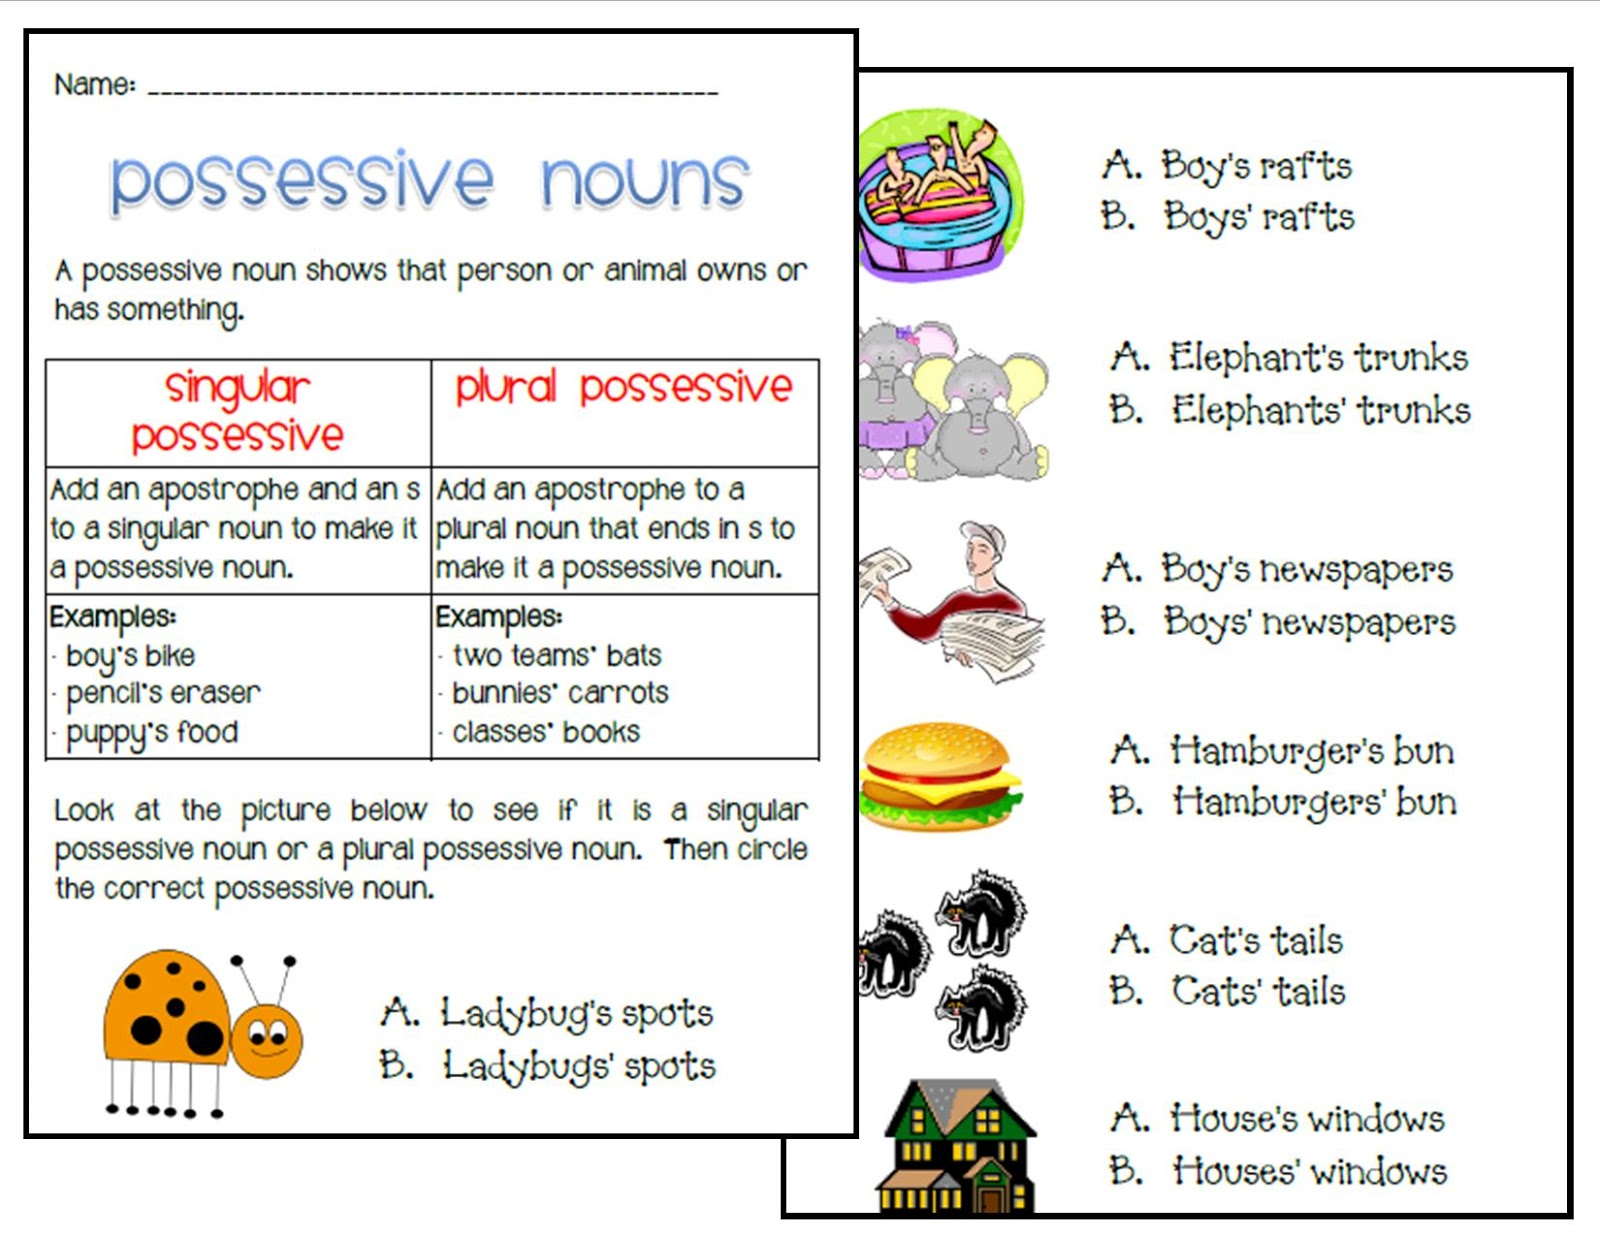 Possessive Nouns - Lessons - Blendspace [ 1236 x 1600 Pixel ]